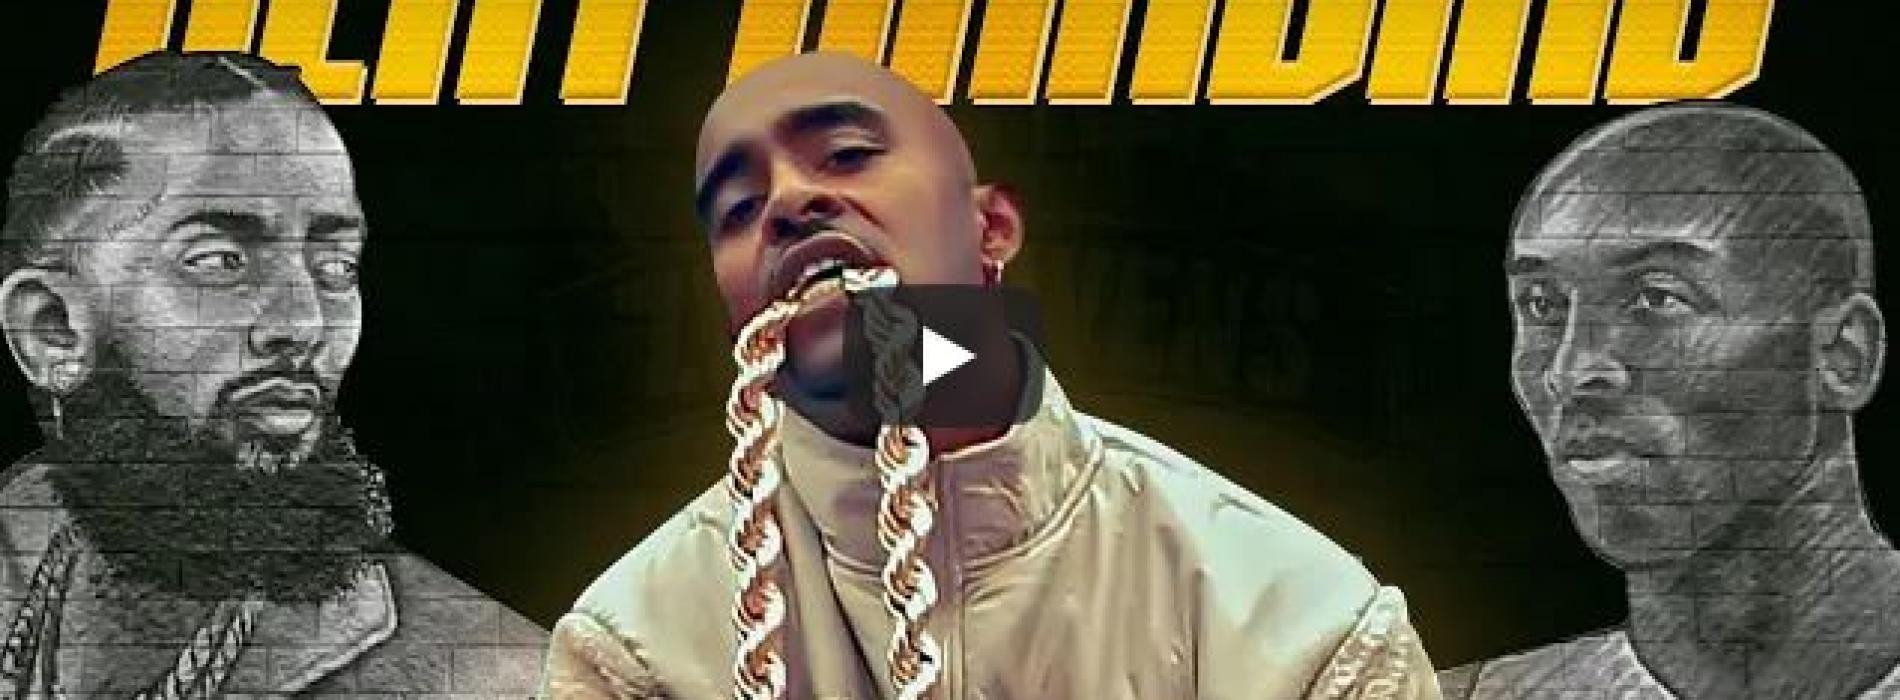 New Music : J-NiL – Beat Banging